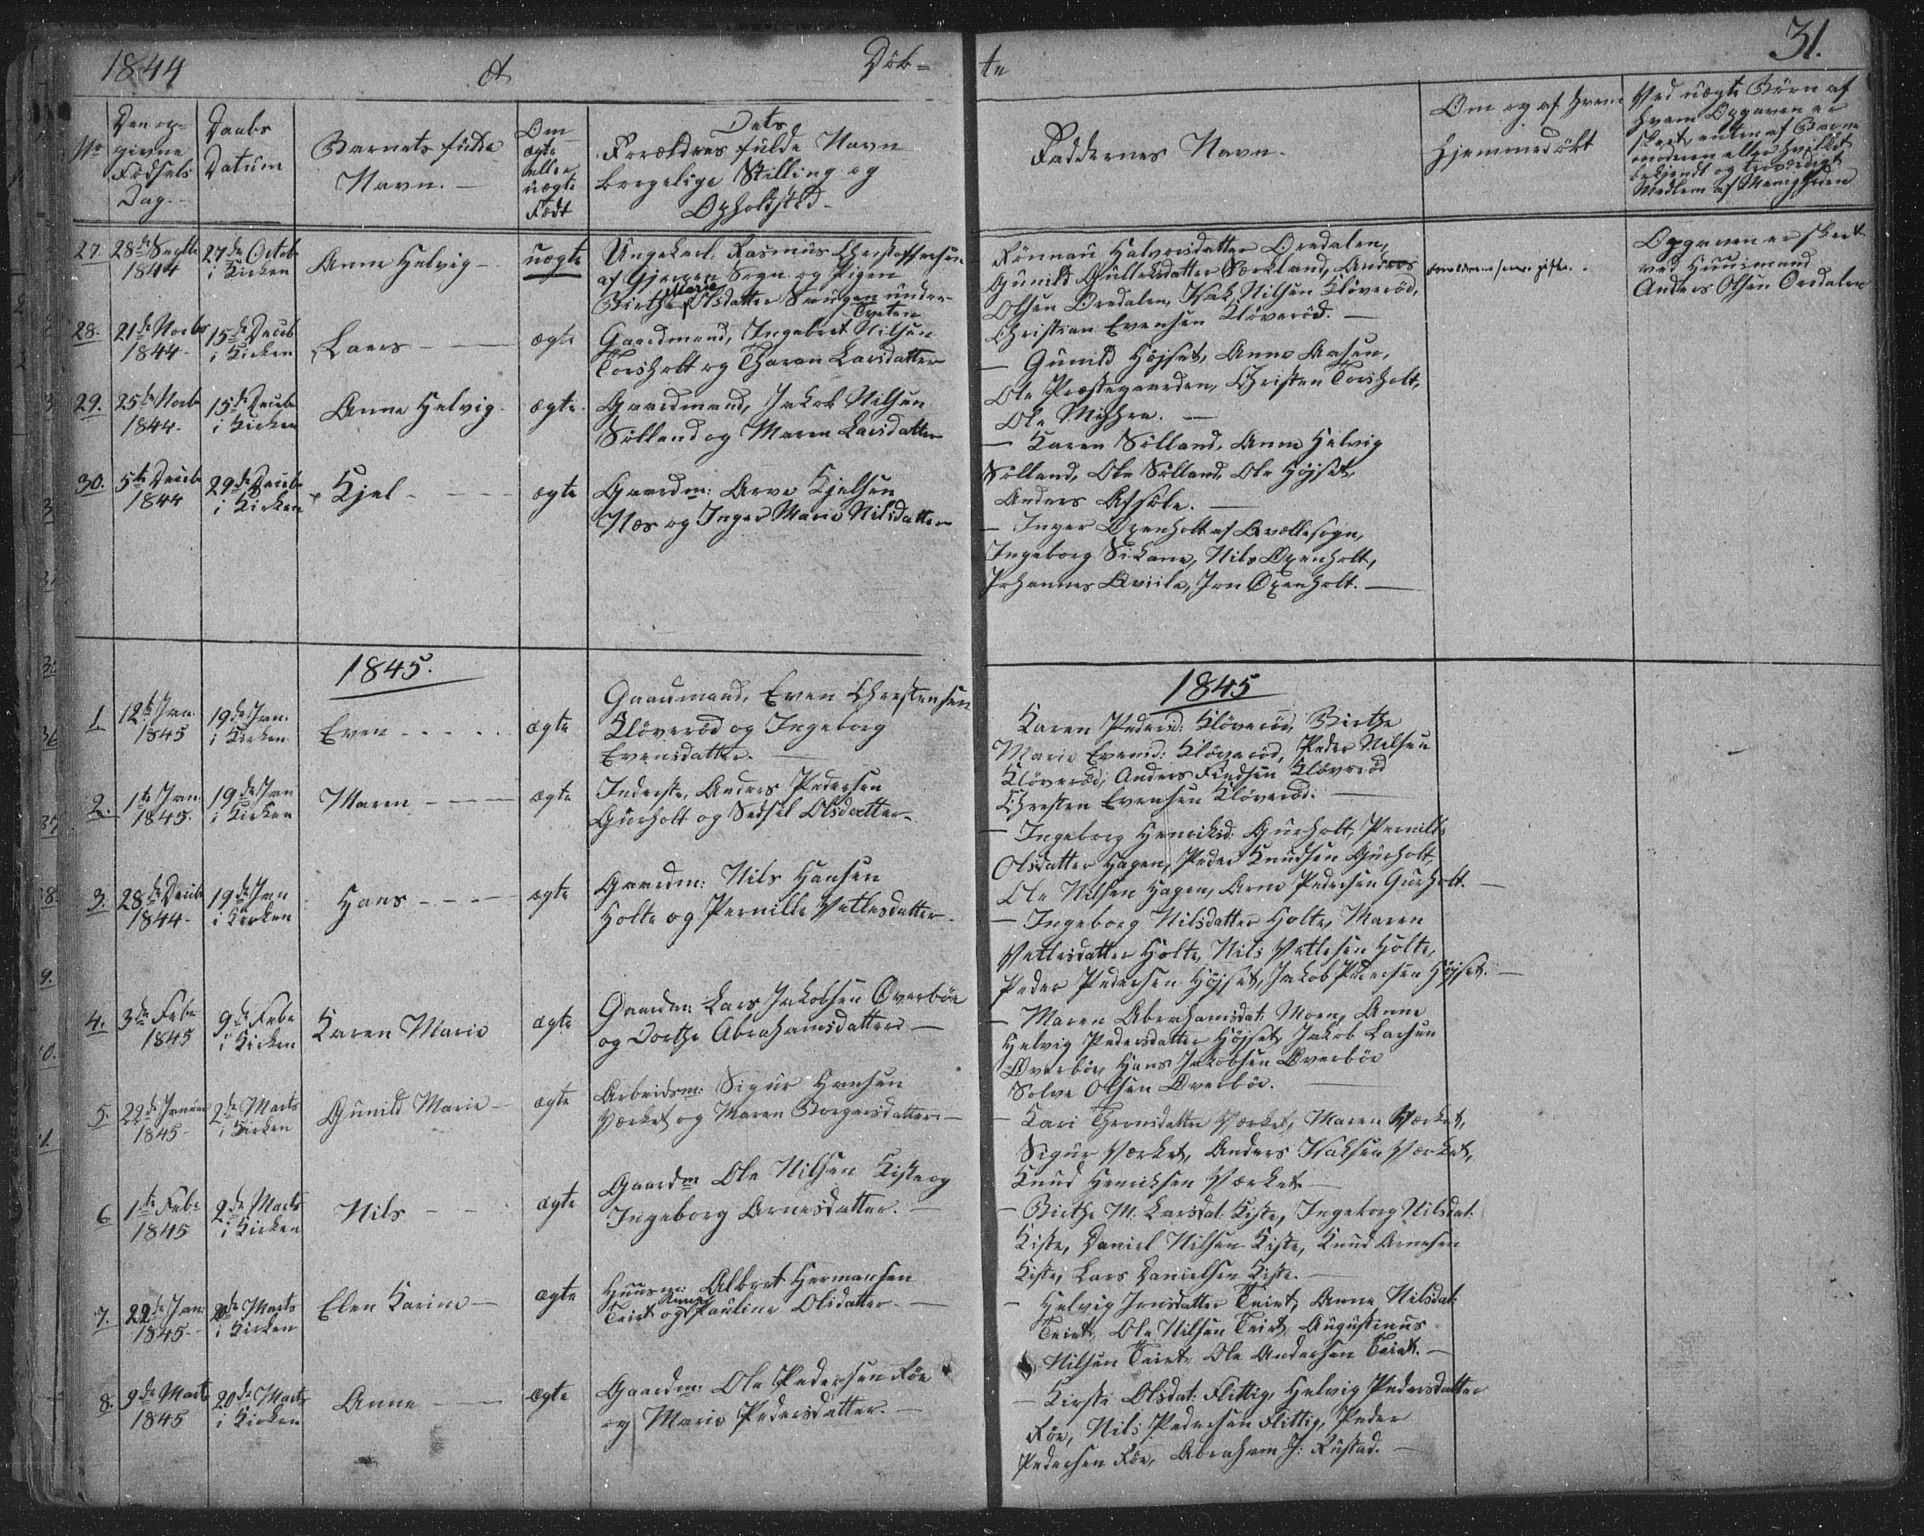 SAKO, Siljan kirkebøker, F/Fa/L0001: Parish register (official) no. 1, 1831-1870, p. 31